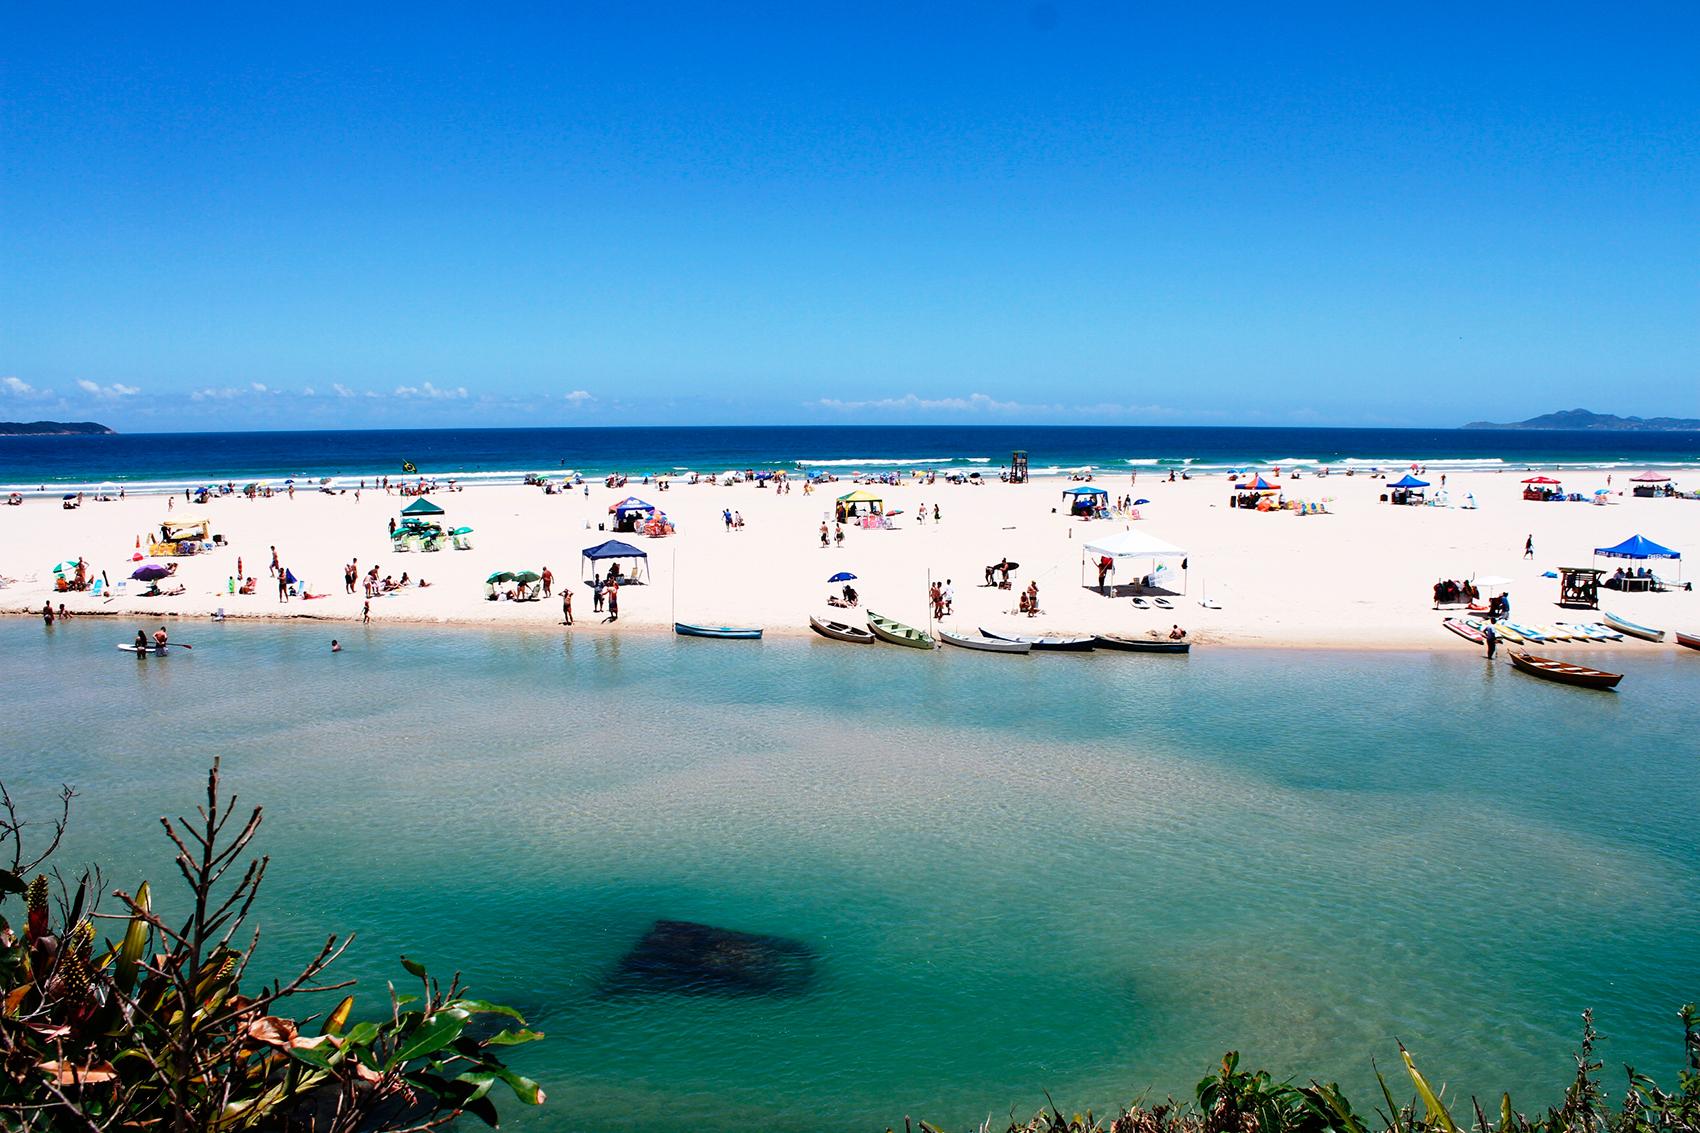 Desfrute das belas praias do litoral catarinense!